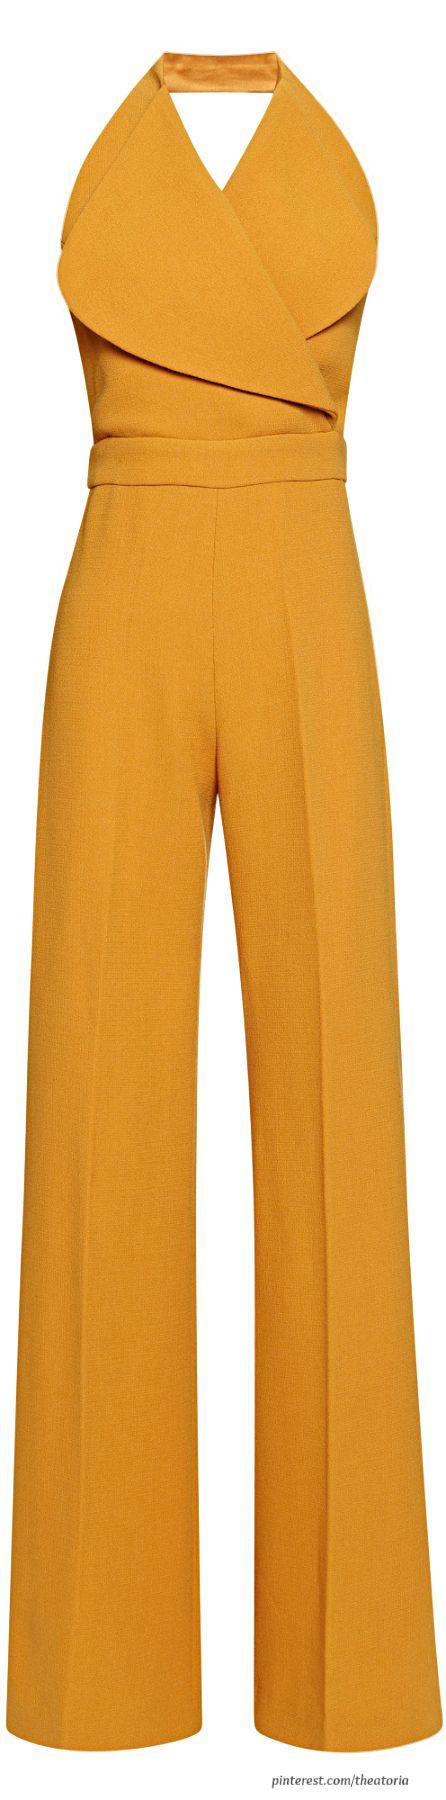 Emilia Wickstead ● FW 2014 - mustard yellow halter jumper